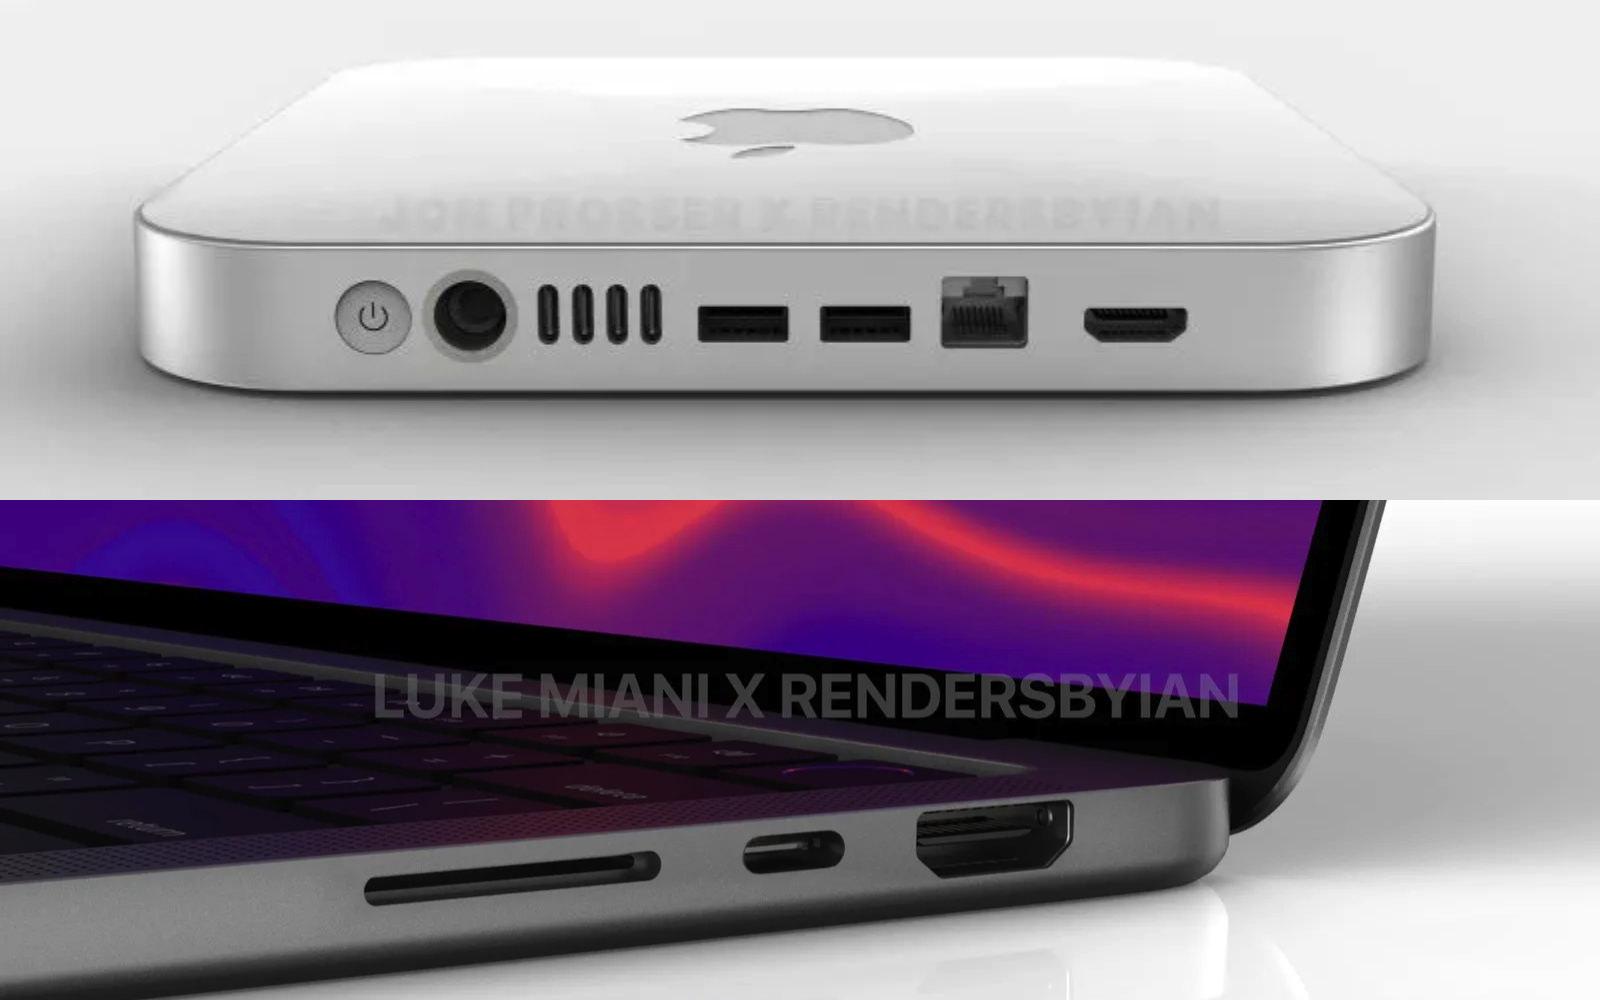 New MacBookPro and Macmini renderings